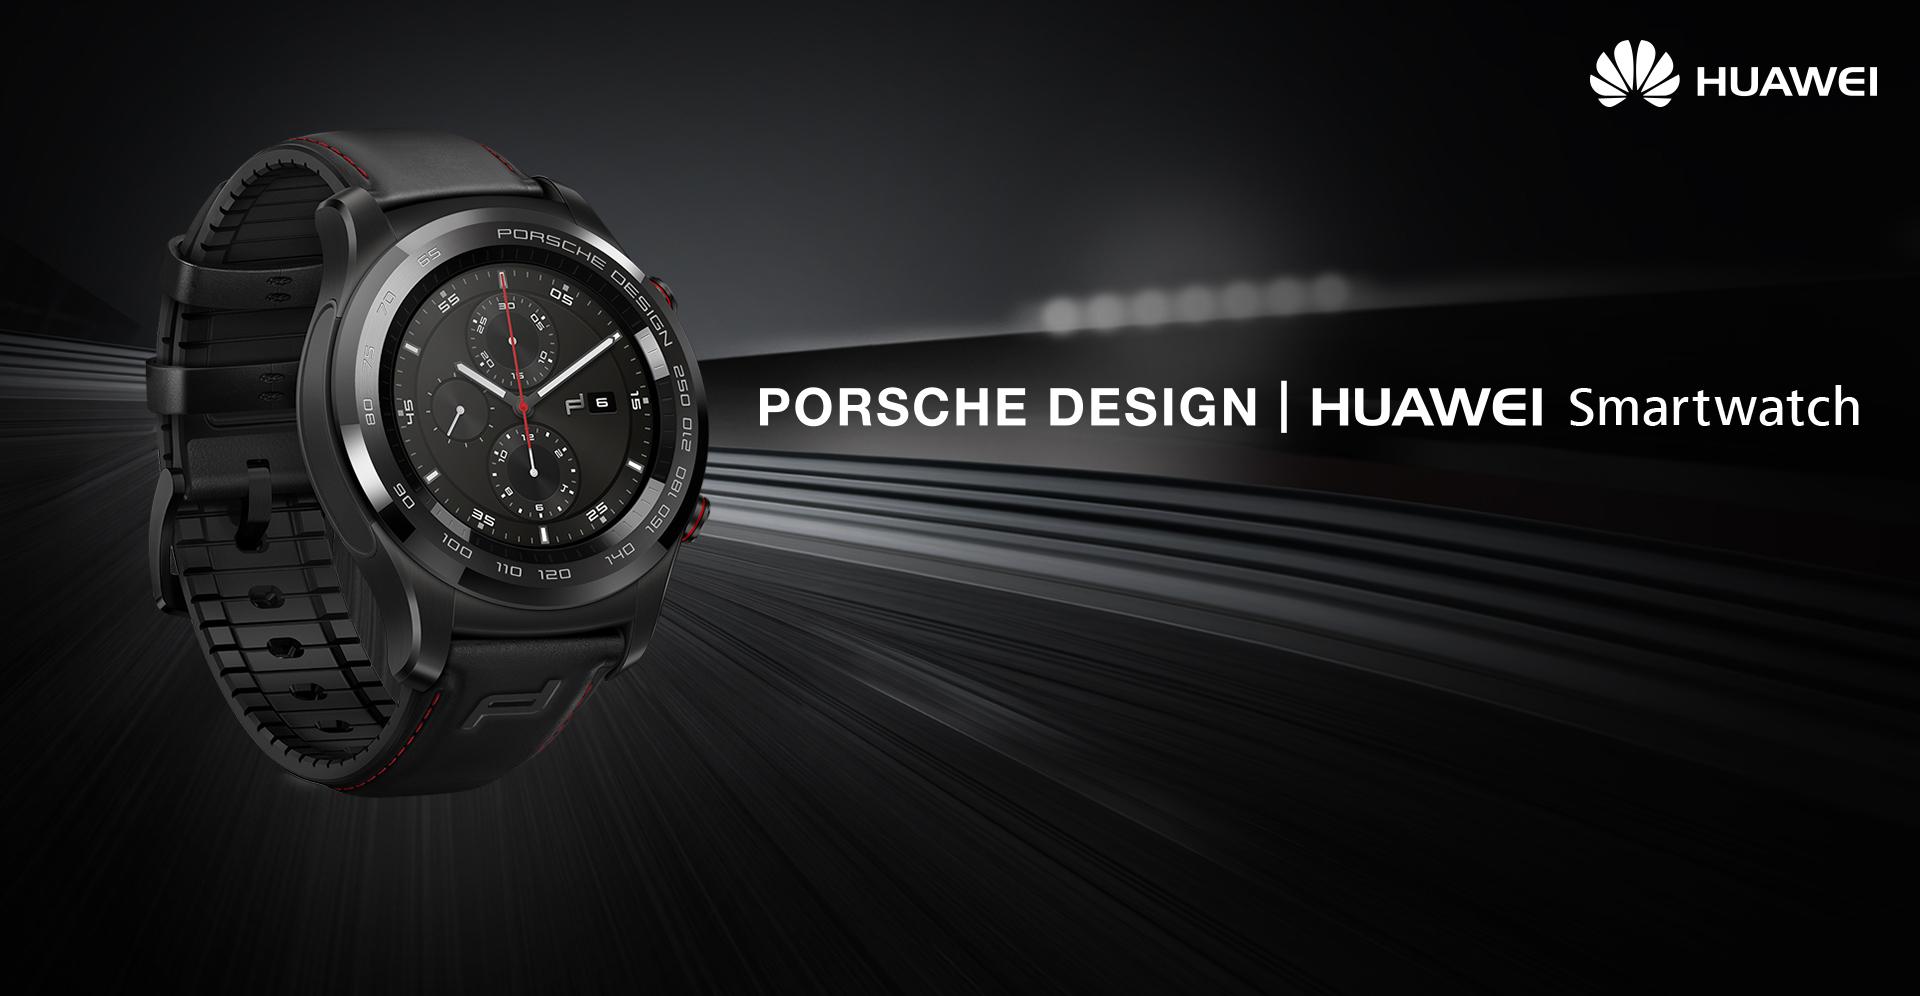 porsche design huawei smartwatch. Black Bedroom Furniture Sets. Home Design Ideas